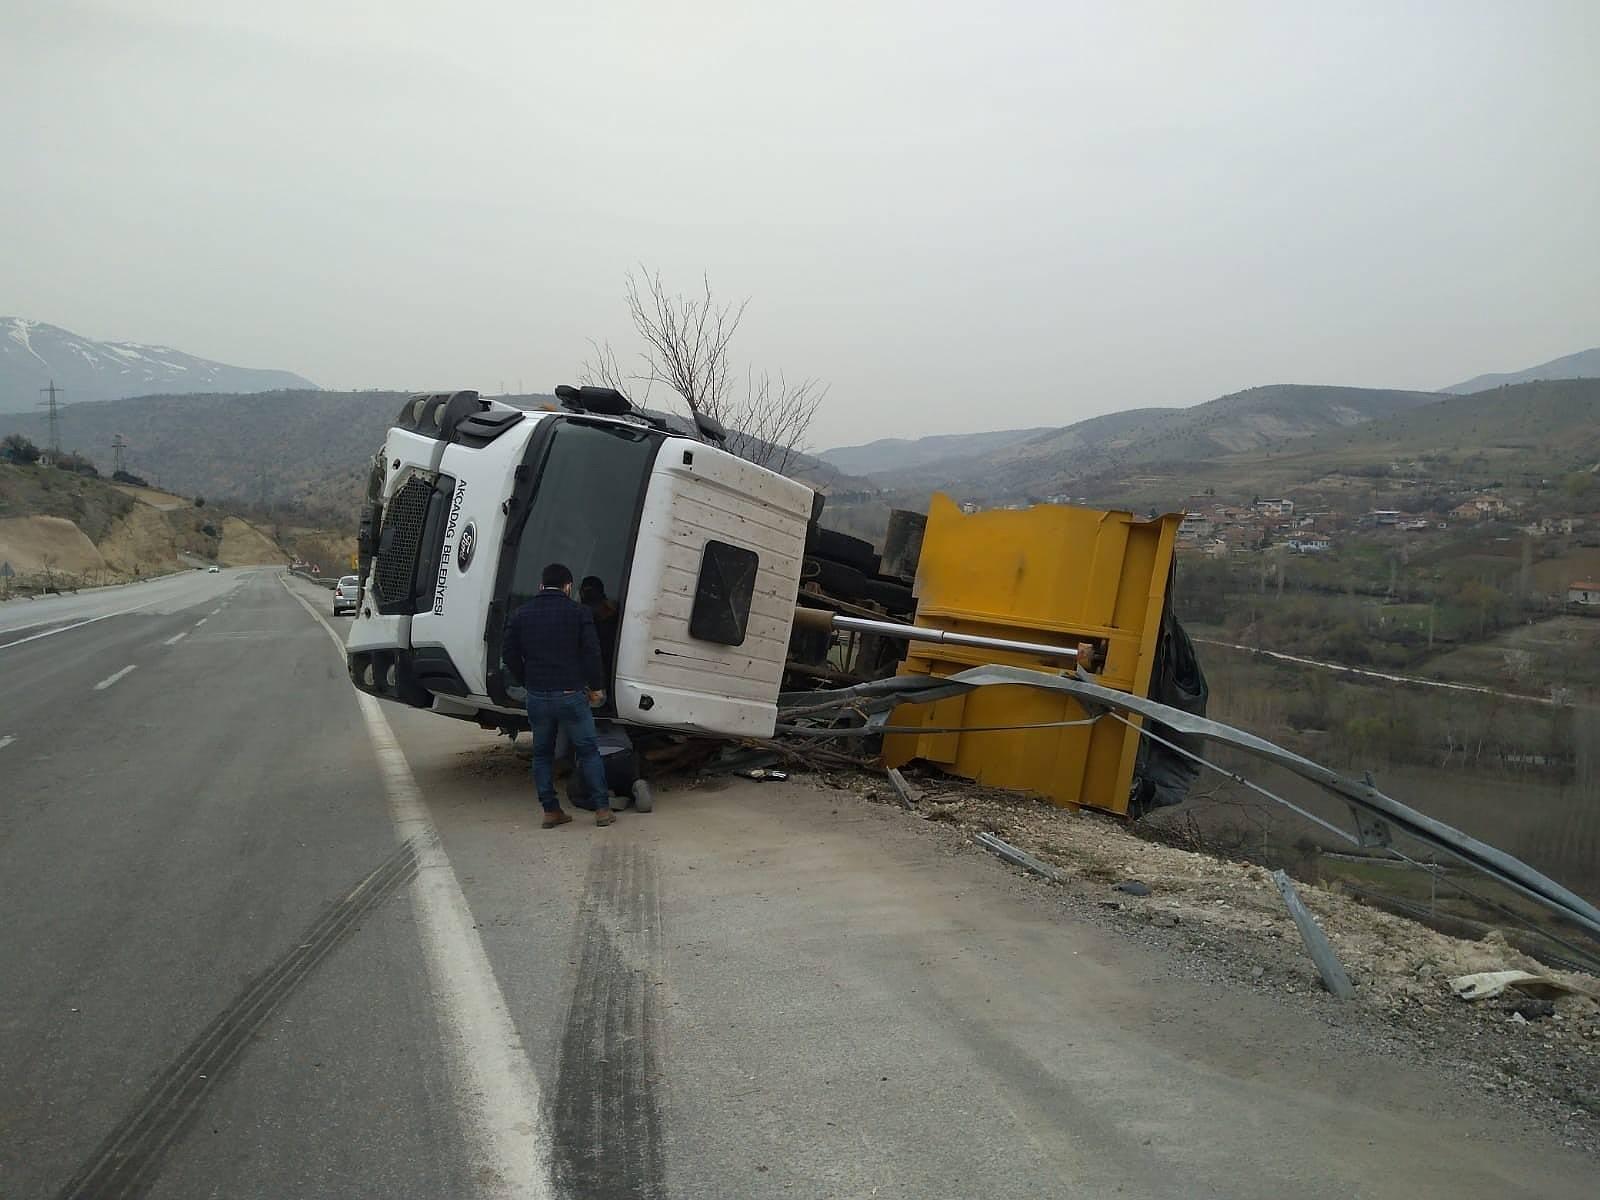 2021/04/hafriyat-kamyonu-devrildi-1-yarali-20210406AW28-3.jpg